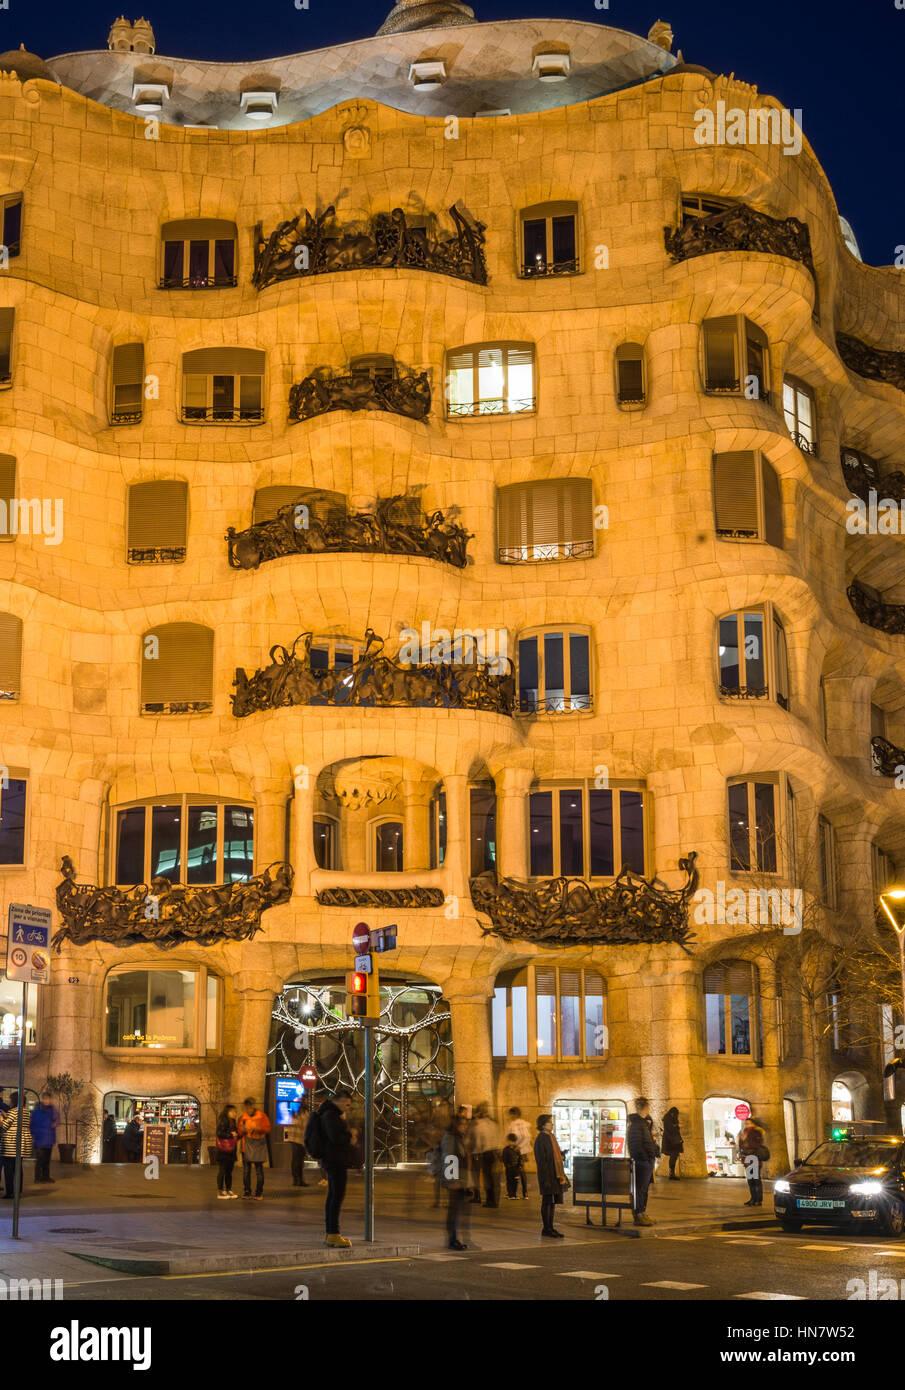 Gaudi's Casa Mila aka La Pedrera after dark, in Barcelona, Spain Stock Photo